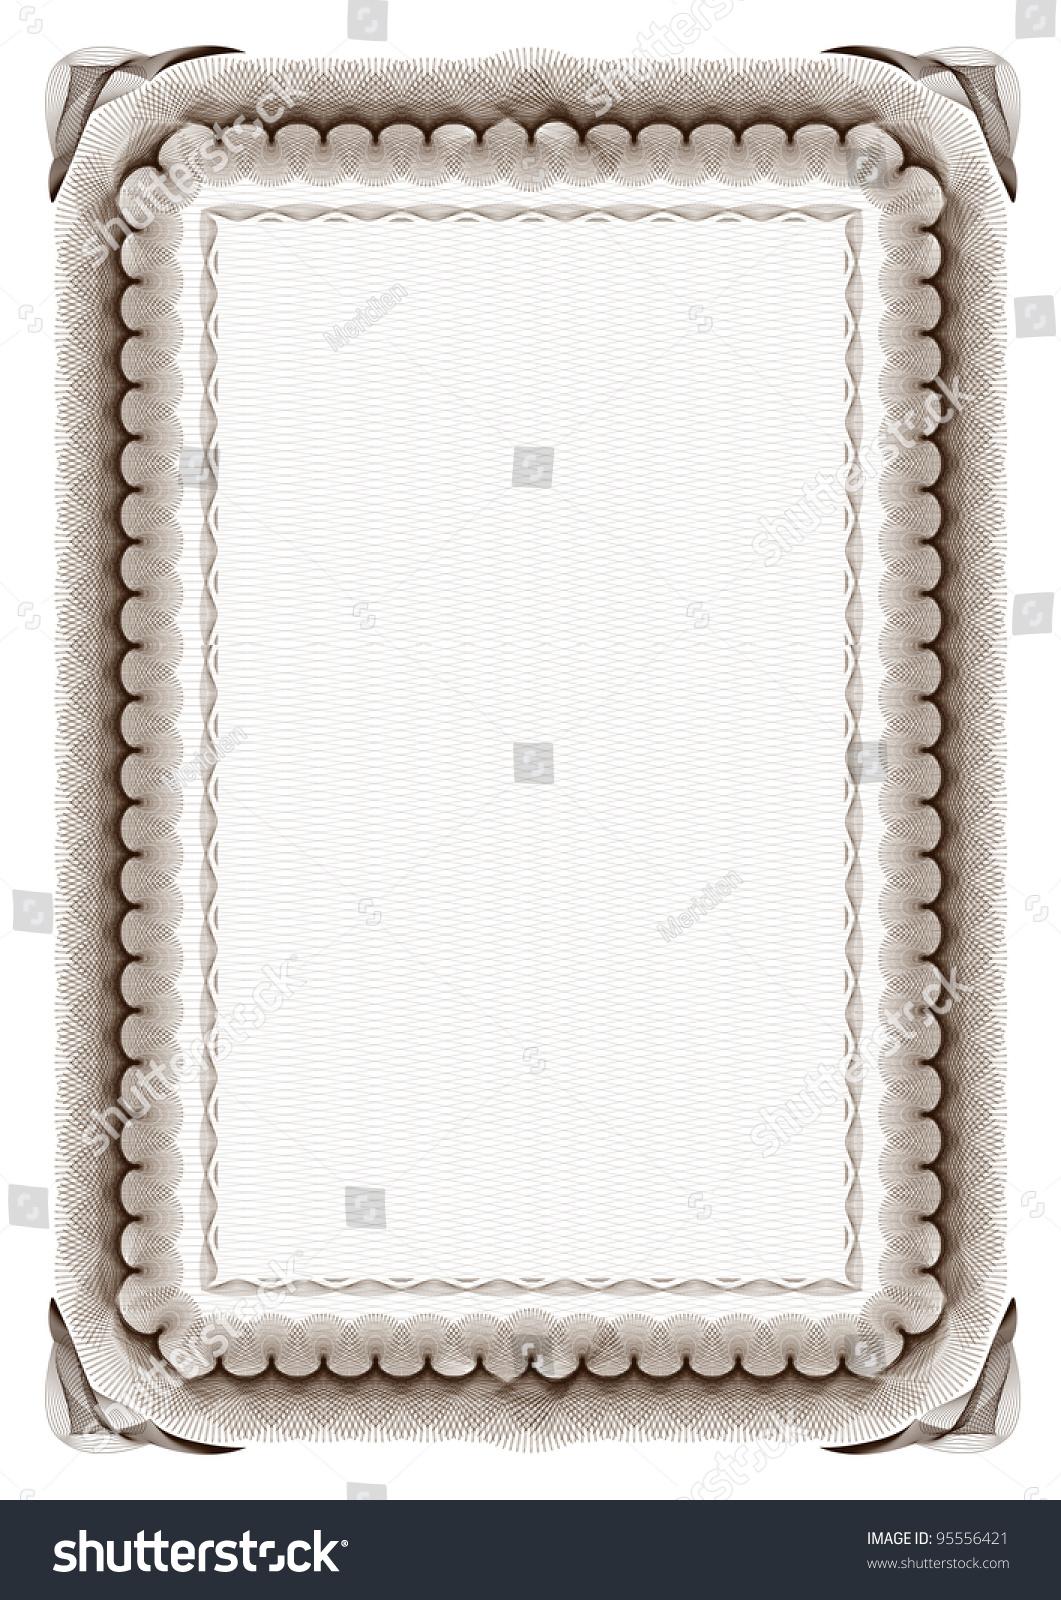 Blank Brown Certificate Frame On White Stock Vector 95556421 ...